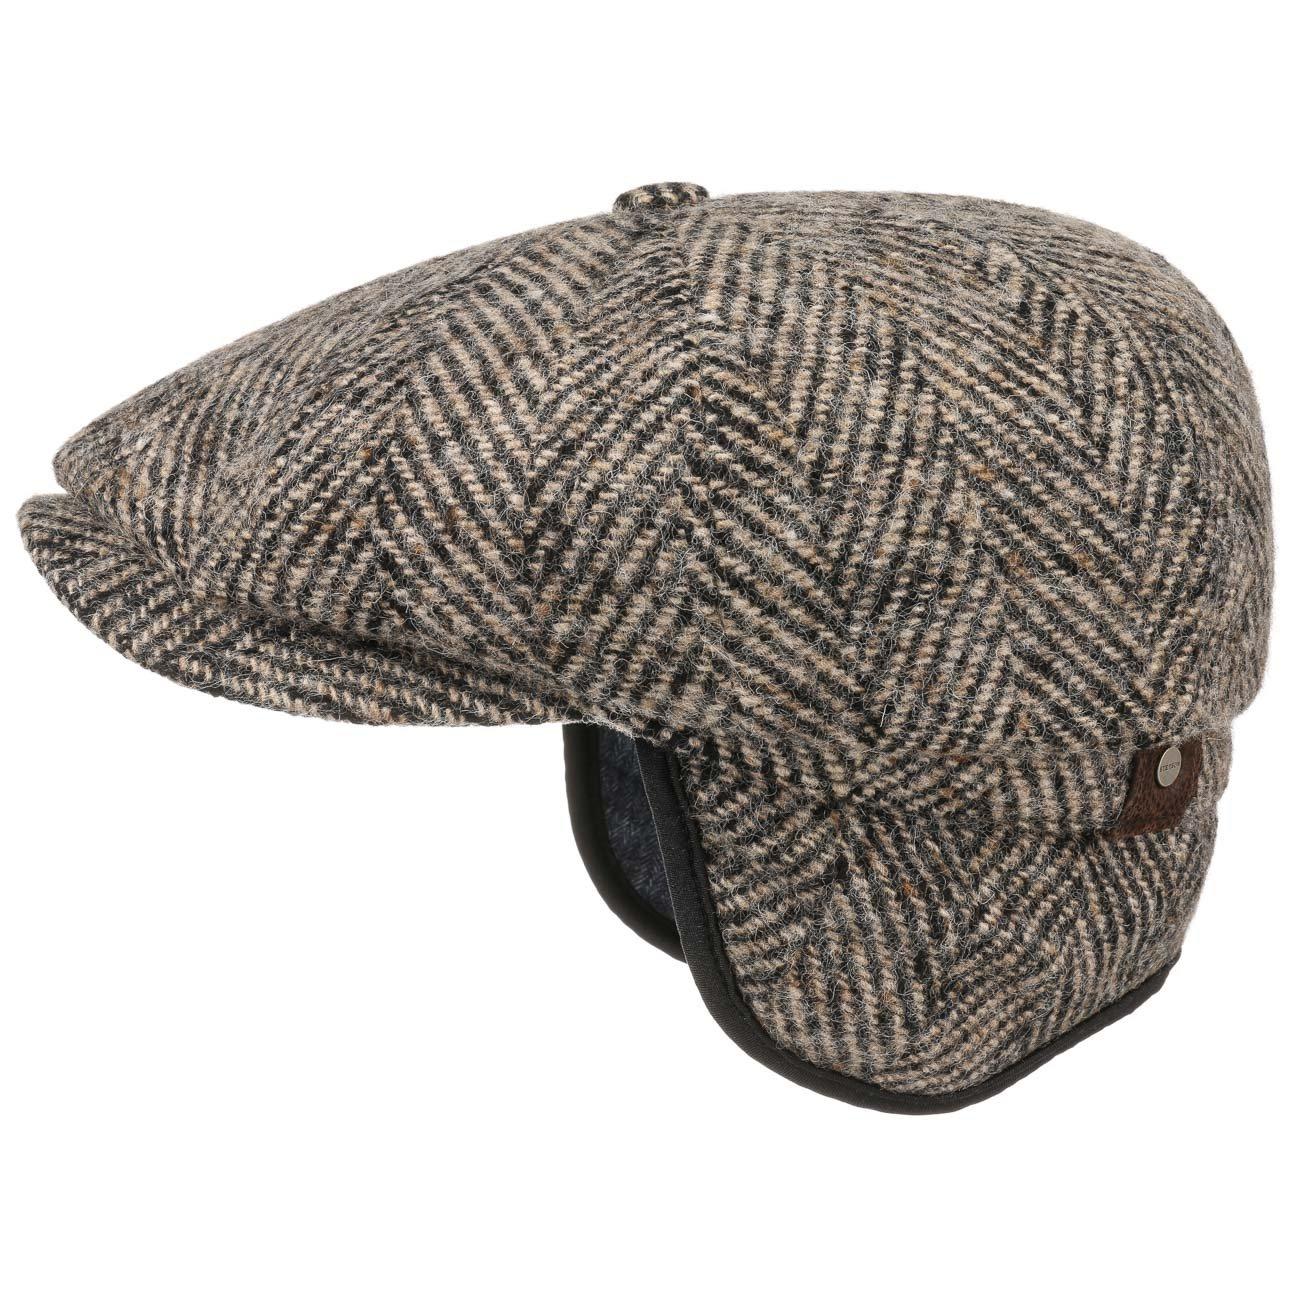 cc62aab8135 Stetson Hatteras Flat Cap with Earflaps Ear Flaps Flat Cap (62 cm - Beige)   Amazon.co.uk  Clothing